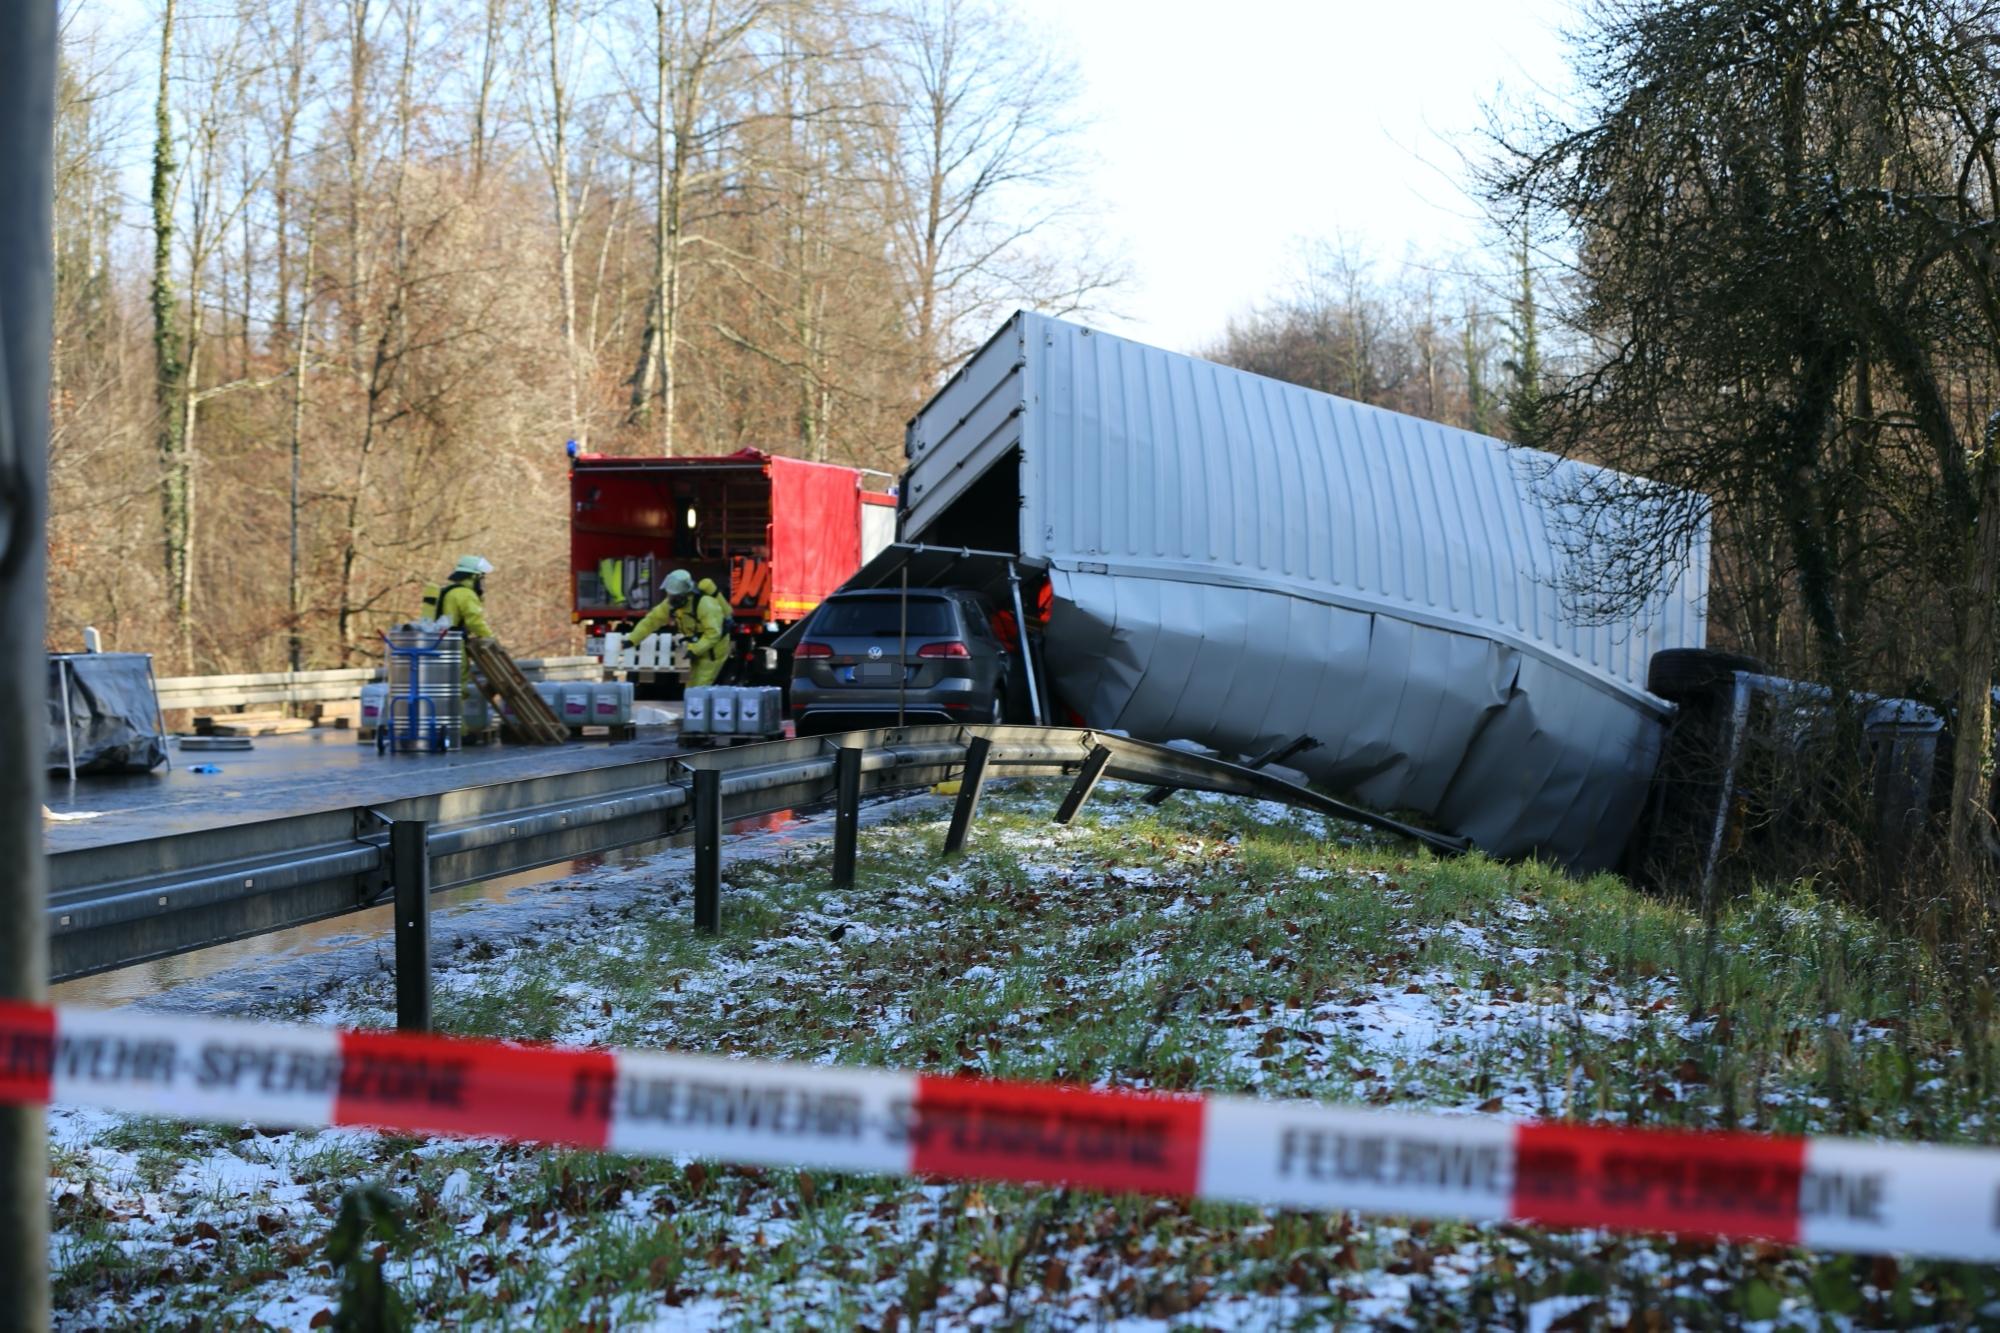 2019-12-10_B30_Ravensburg_Enzisreute_Baindt_Lkw-Unfall-Gefahrgut_Feuerwehr_PoeppelIMG_2511